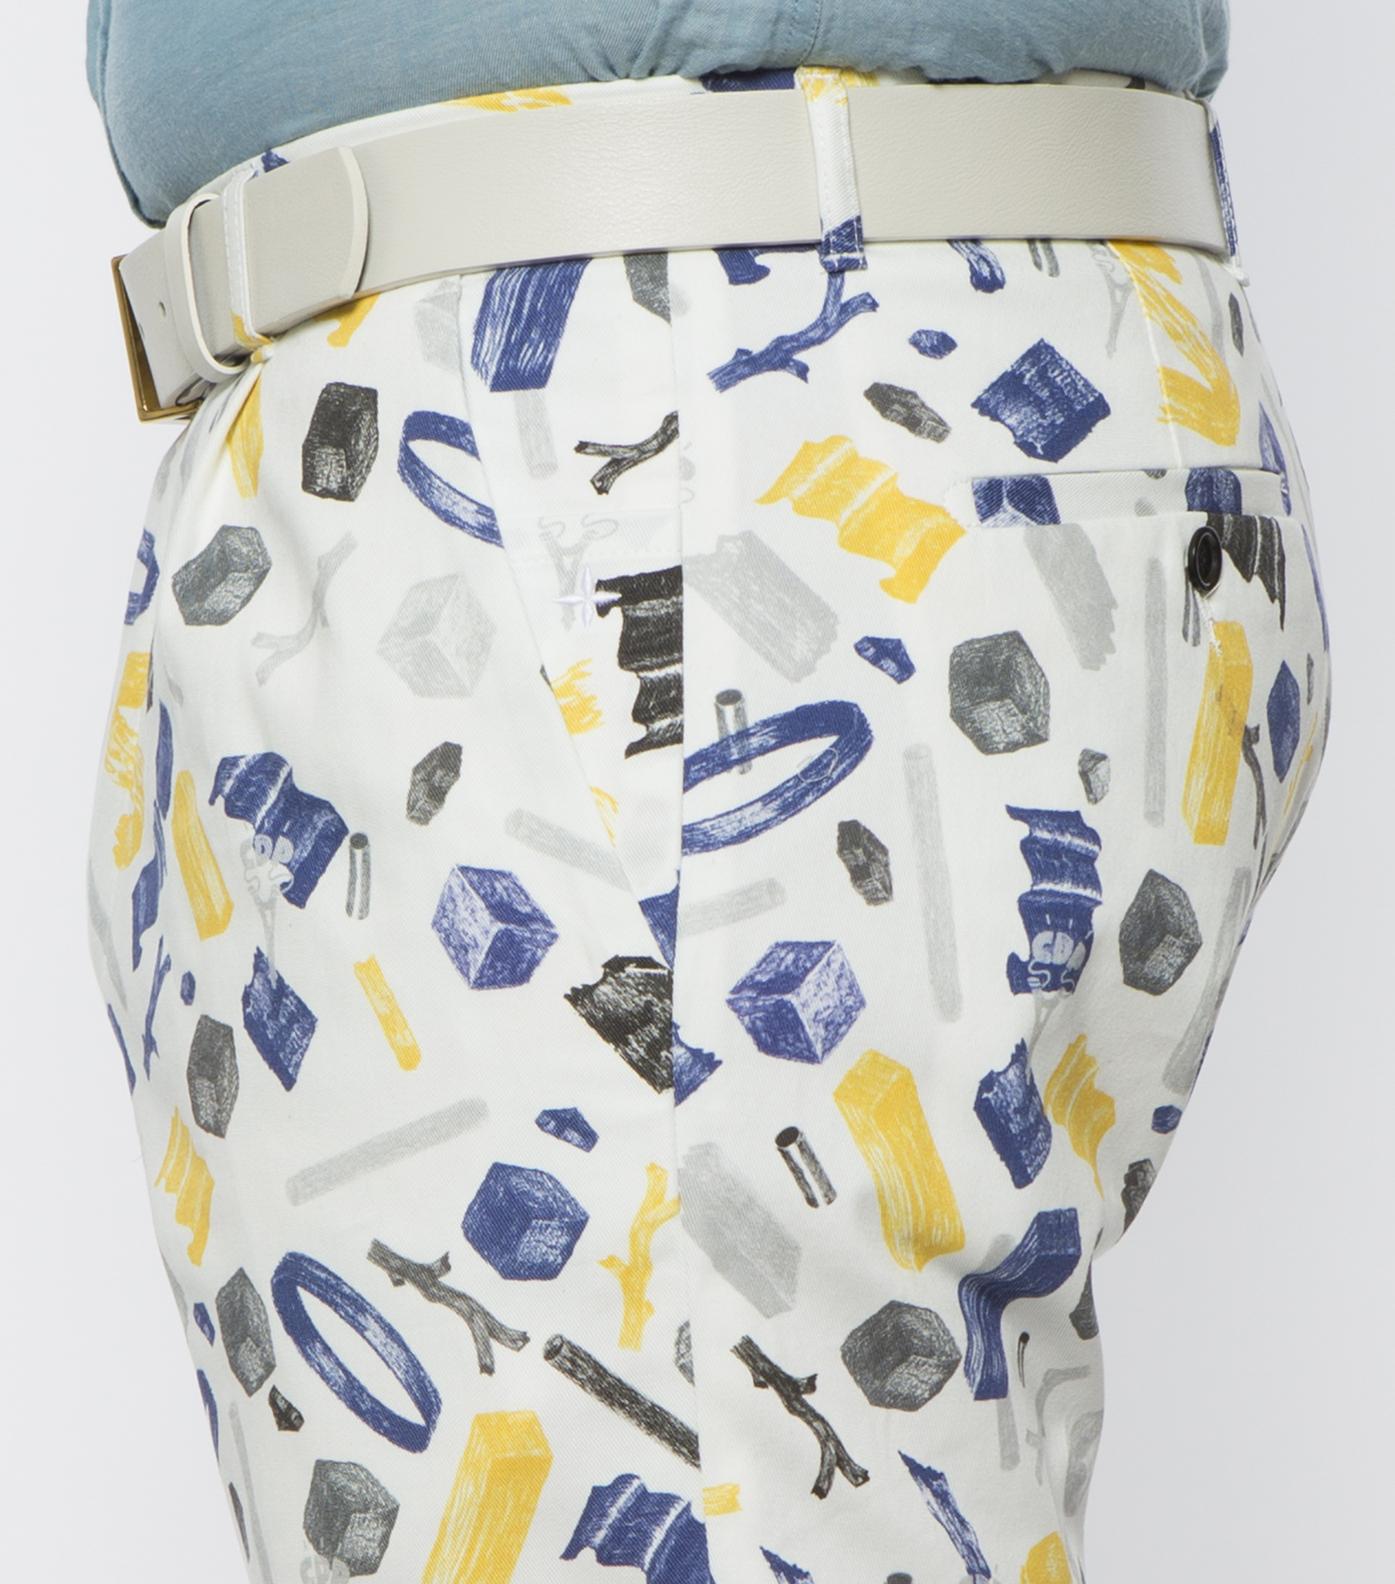 Shiortpants SP5 01 - Print chaos